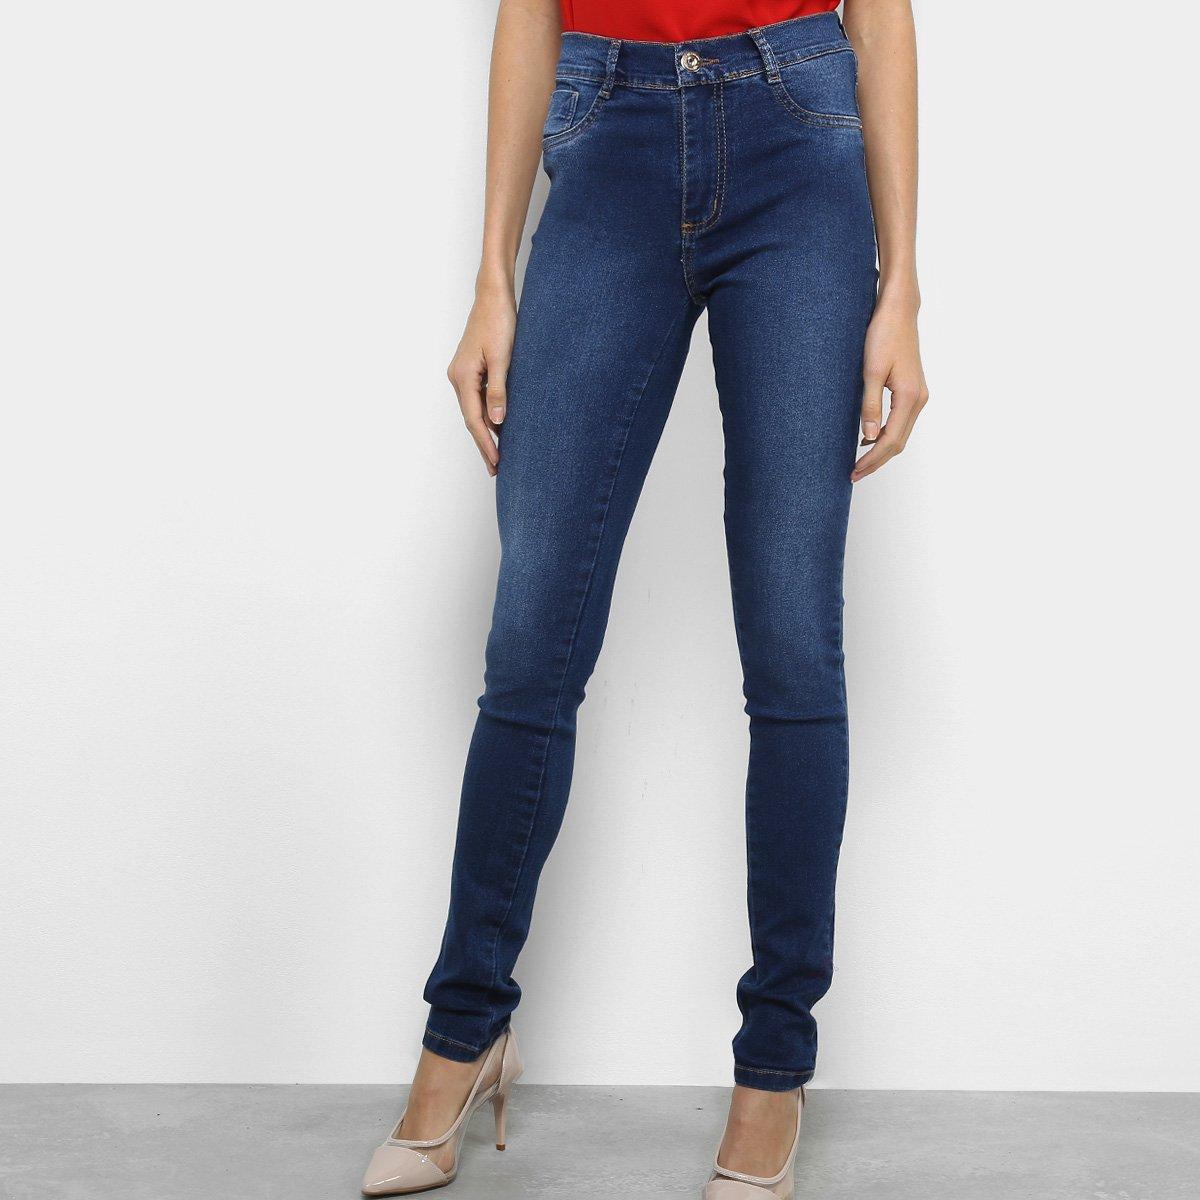 3389cae0b Calça Jeans Slim Sawary Estonada Cintura Alta Feminina | Zattini